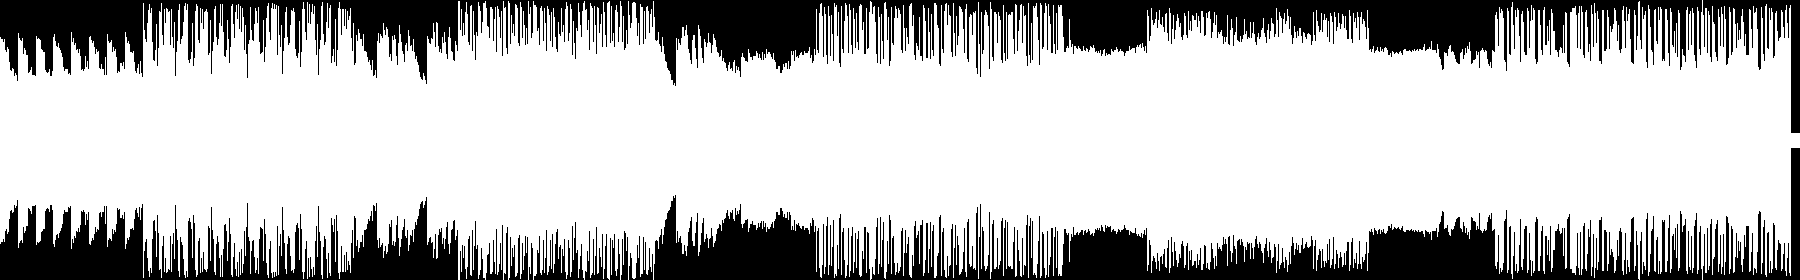 Pixel Lo-Fi audio waveform